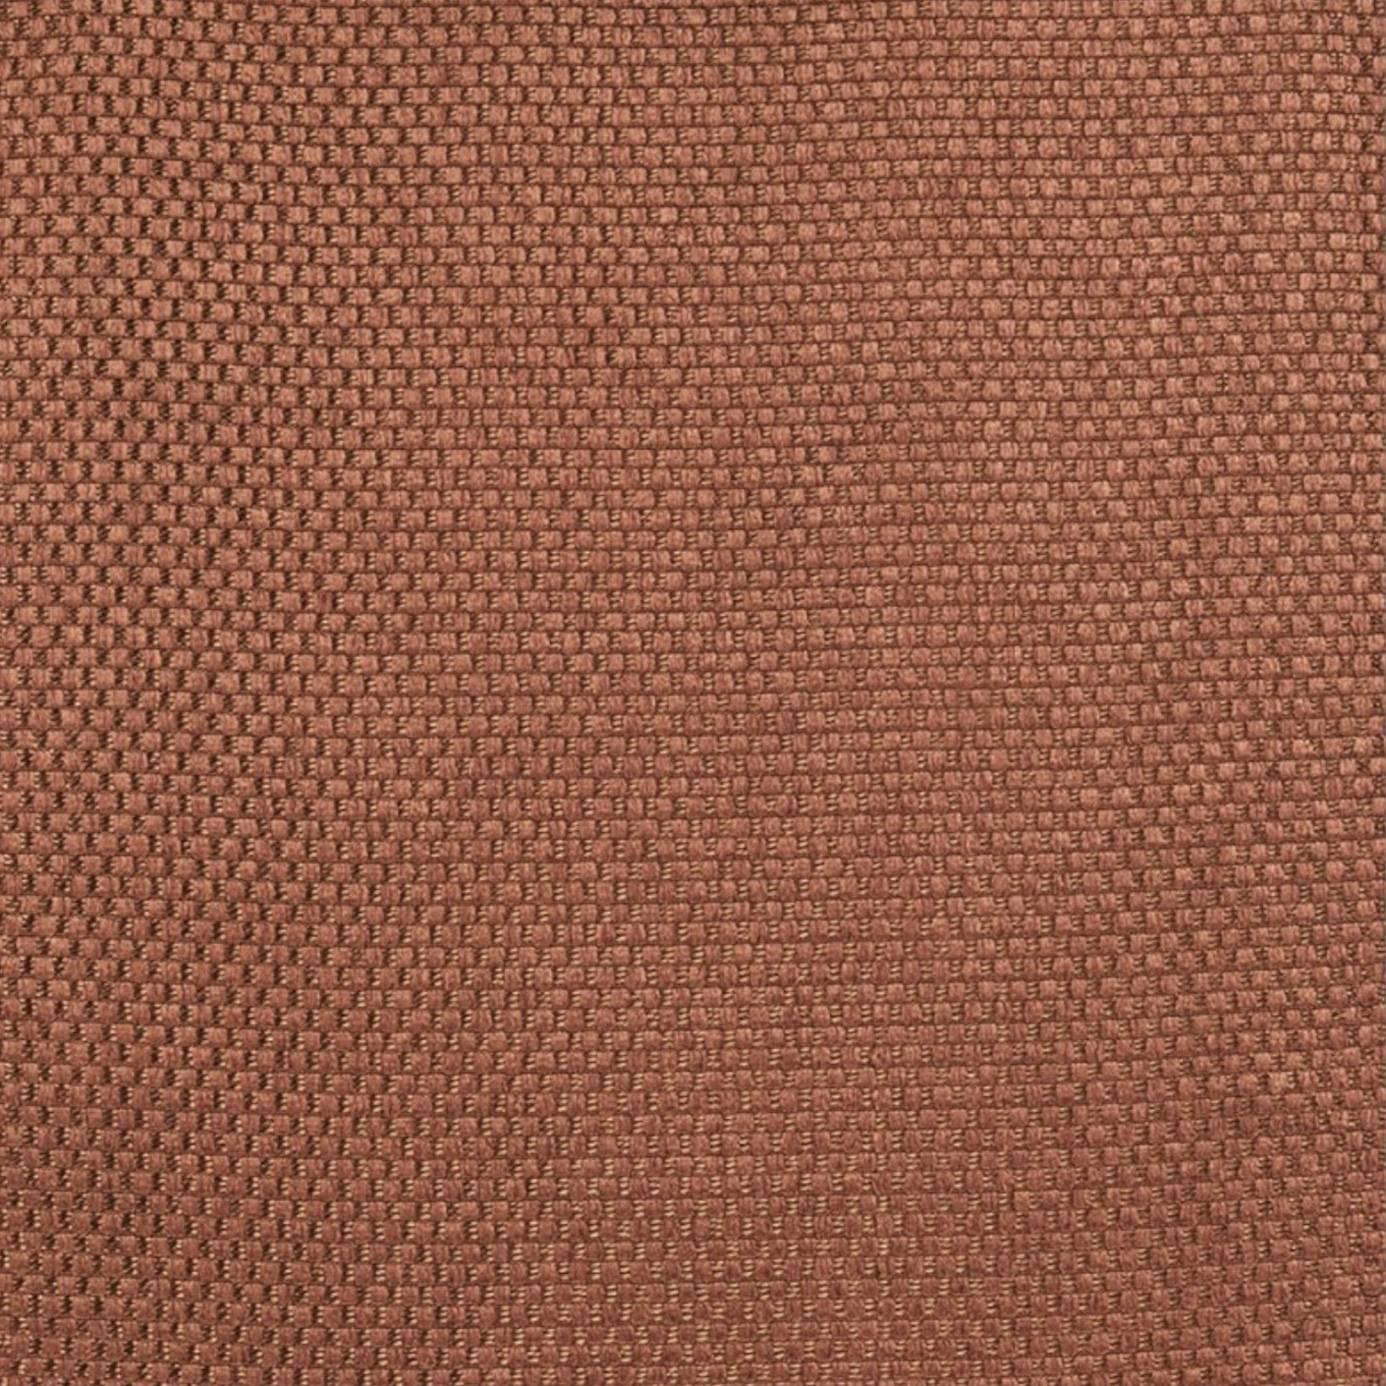 Glisten Fabric Terracotta 140986 Harlequin Palais